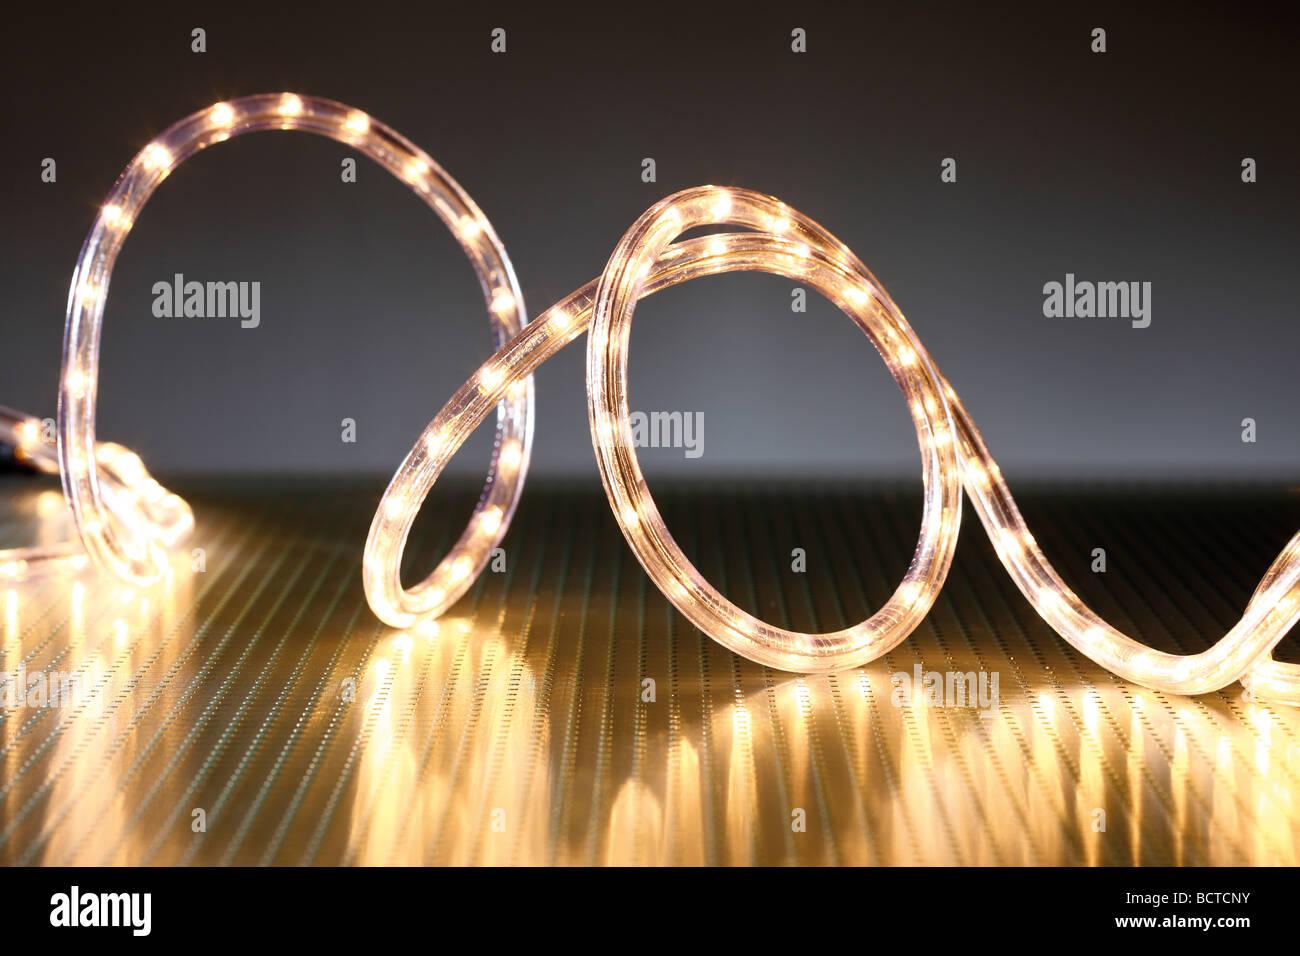 LED light tube, chain of lights, Christmas illumination Stock Photo